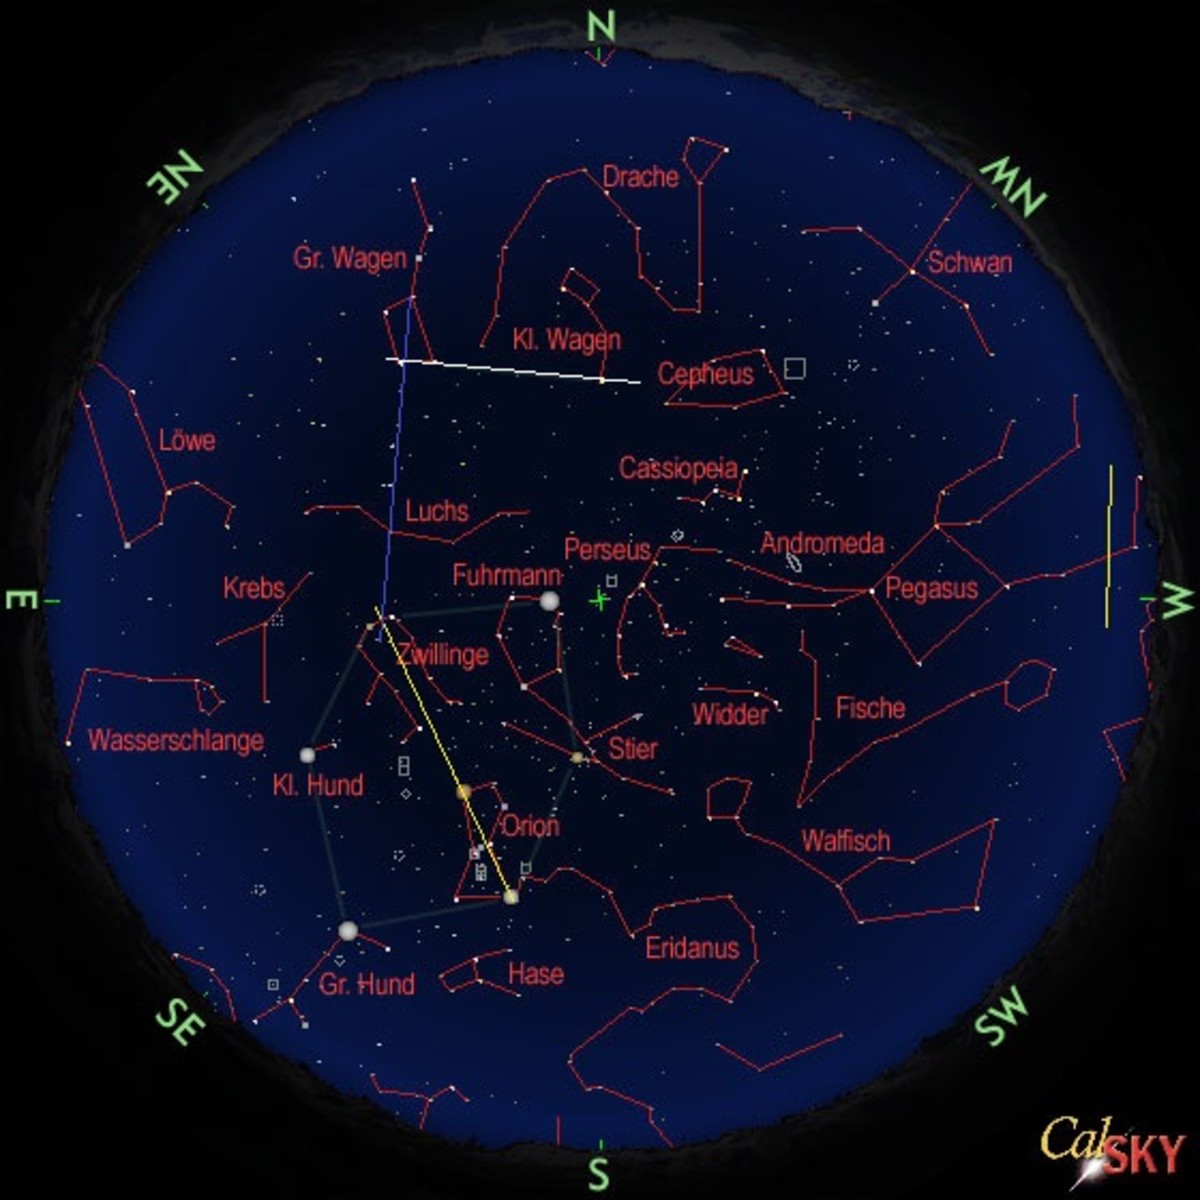 Locating Gemini in the Night Sky